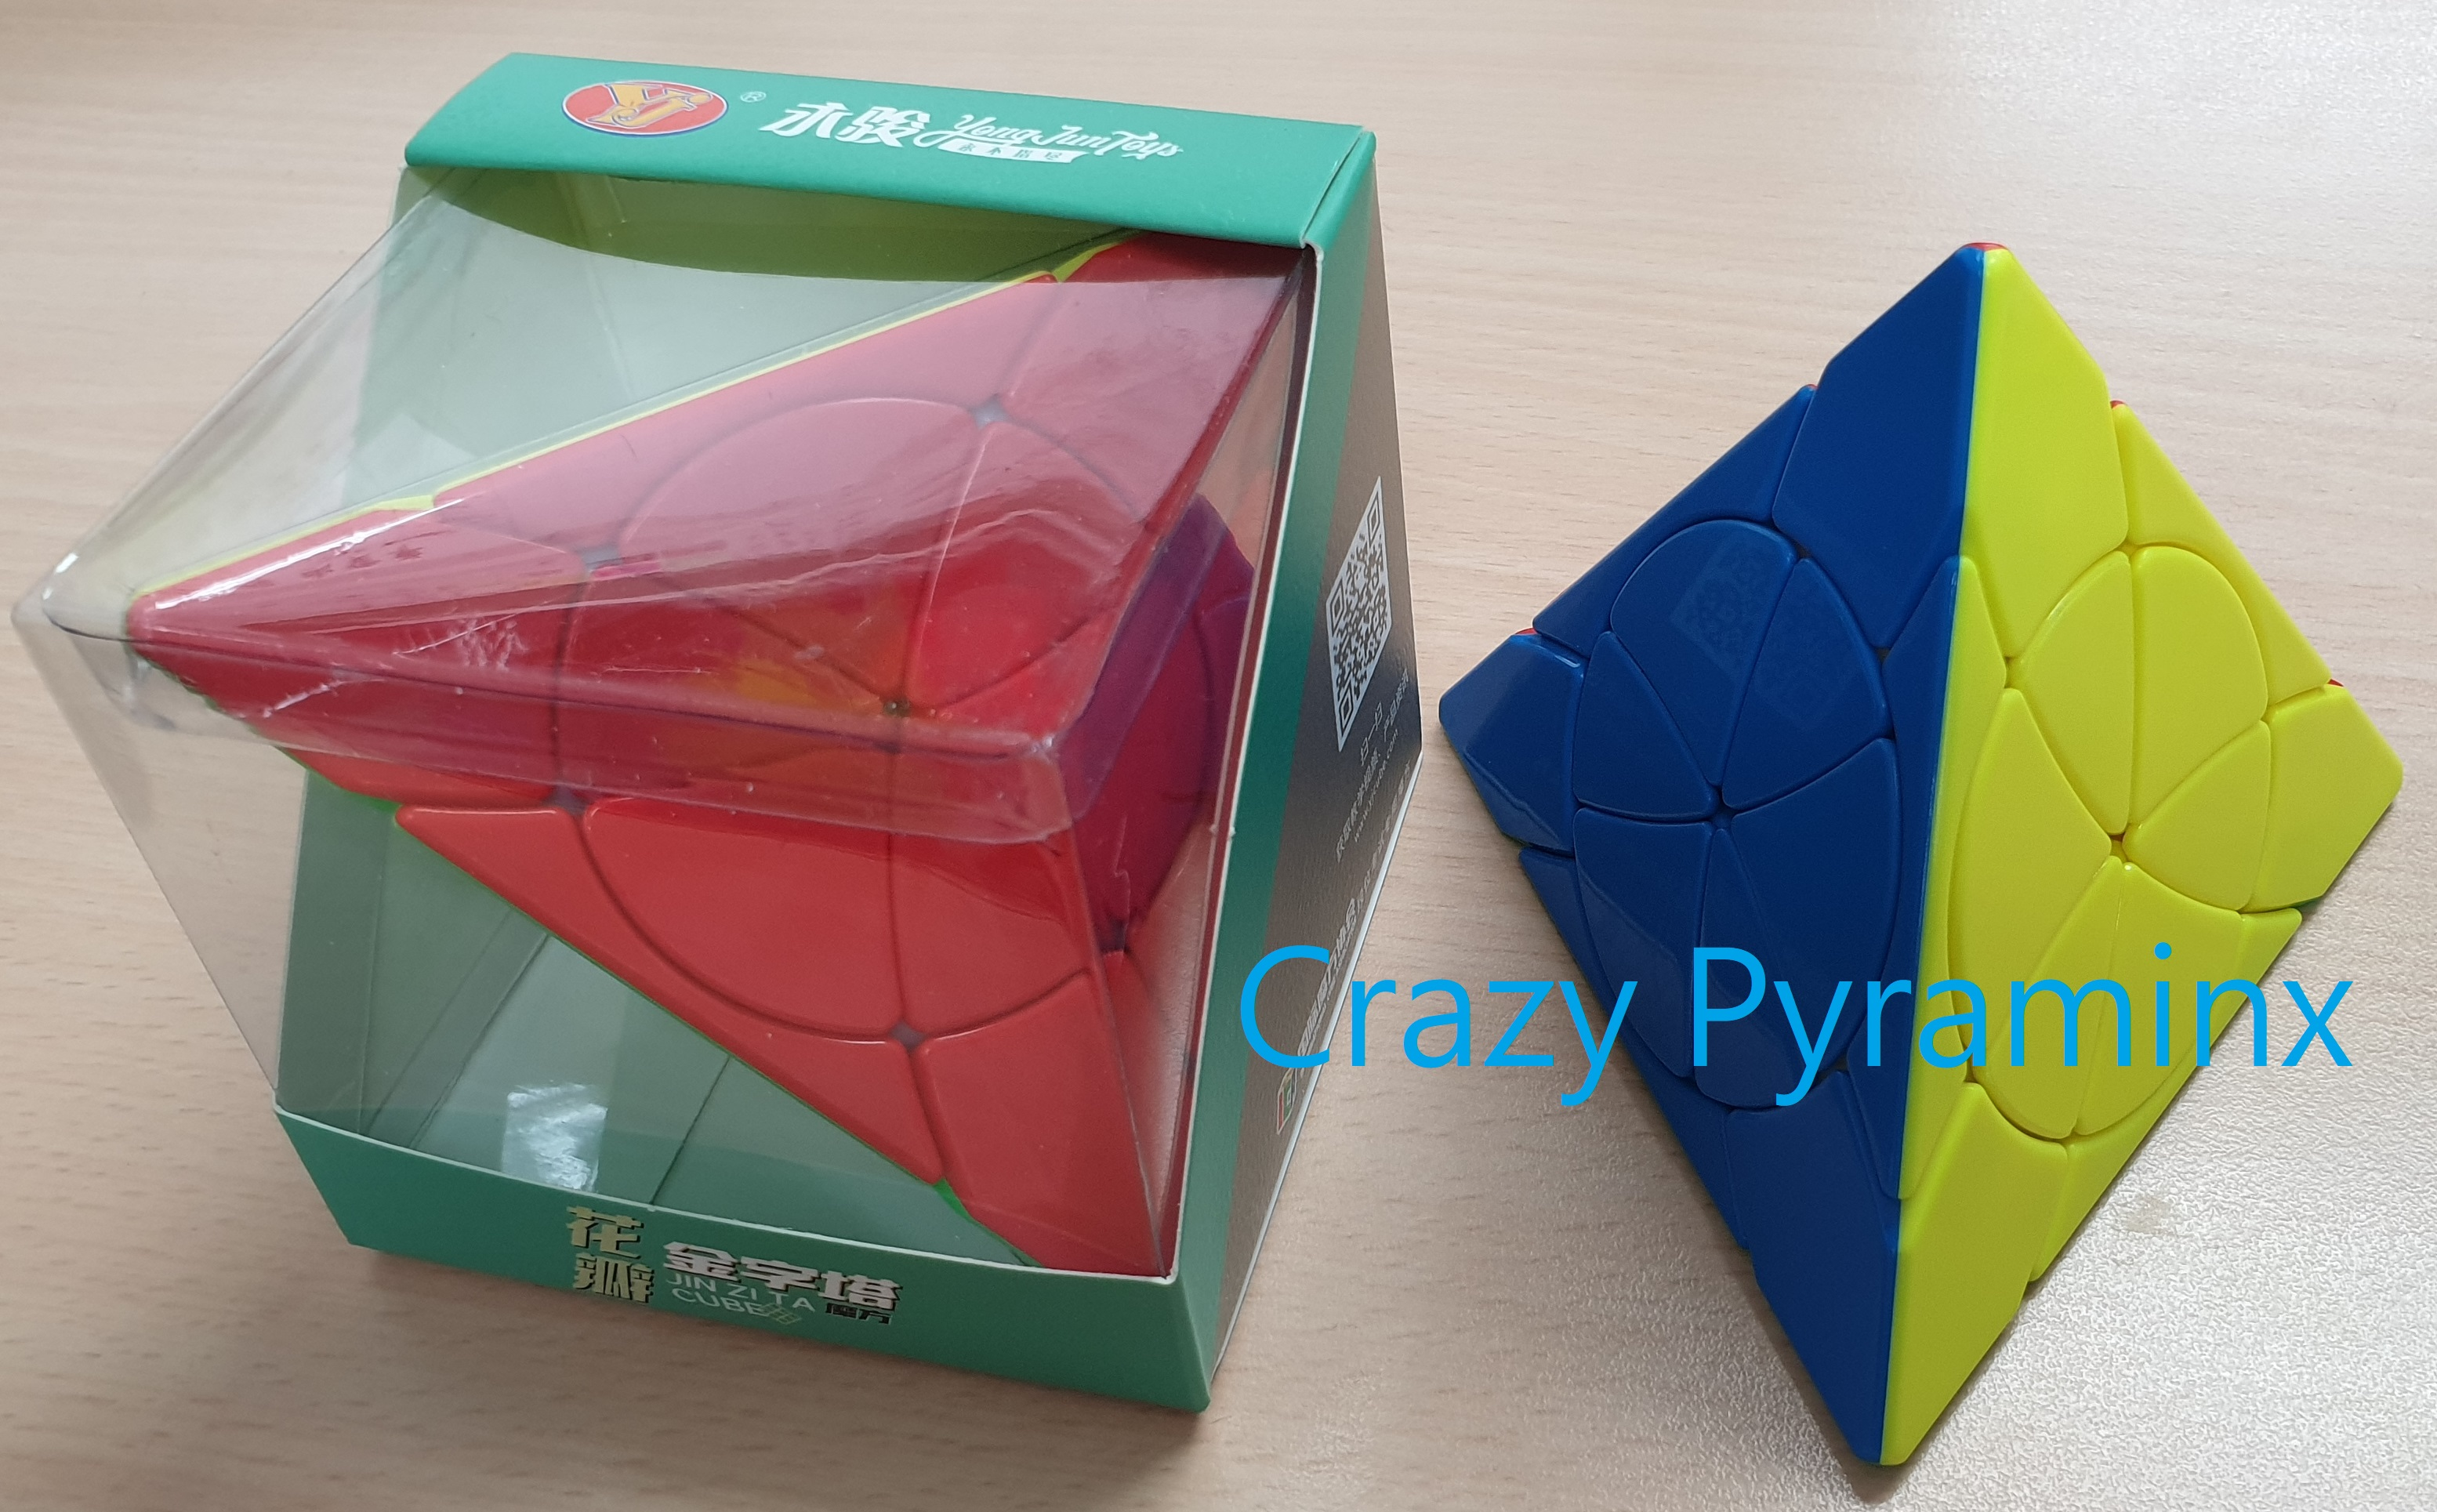 永駿花瓣金字塔(Crazy Pyraminx)